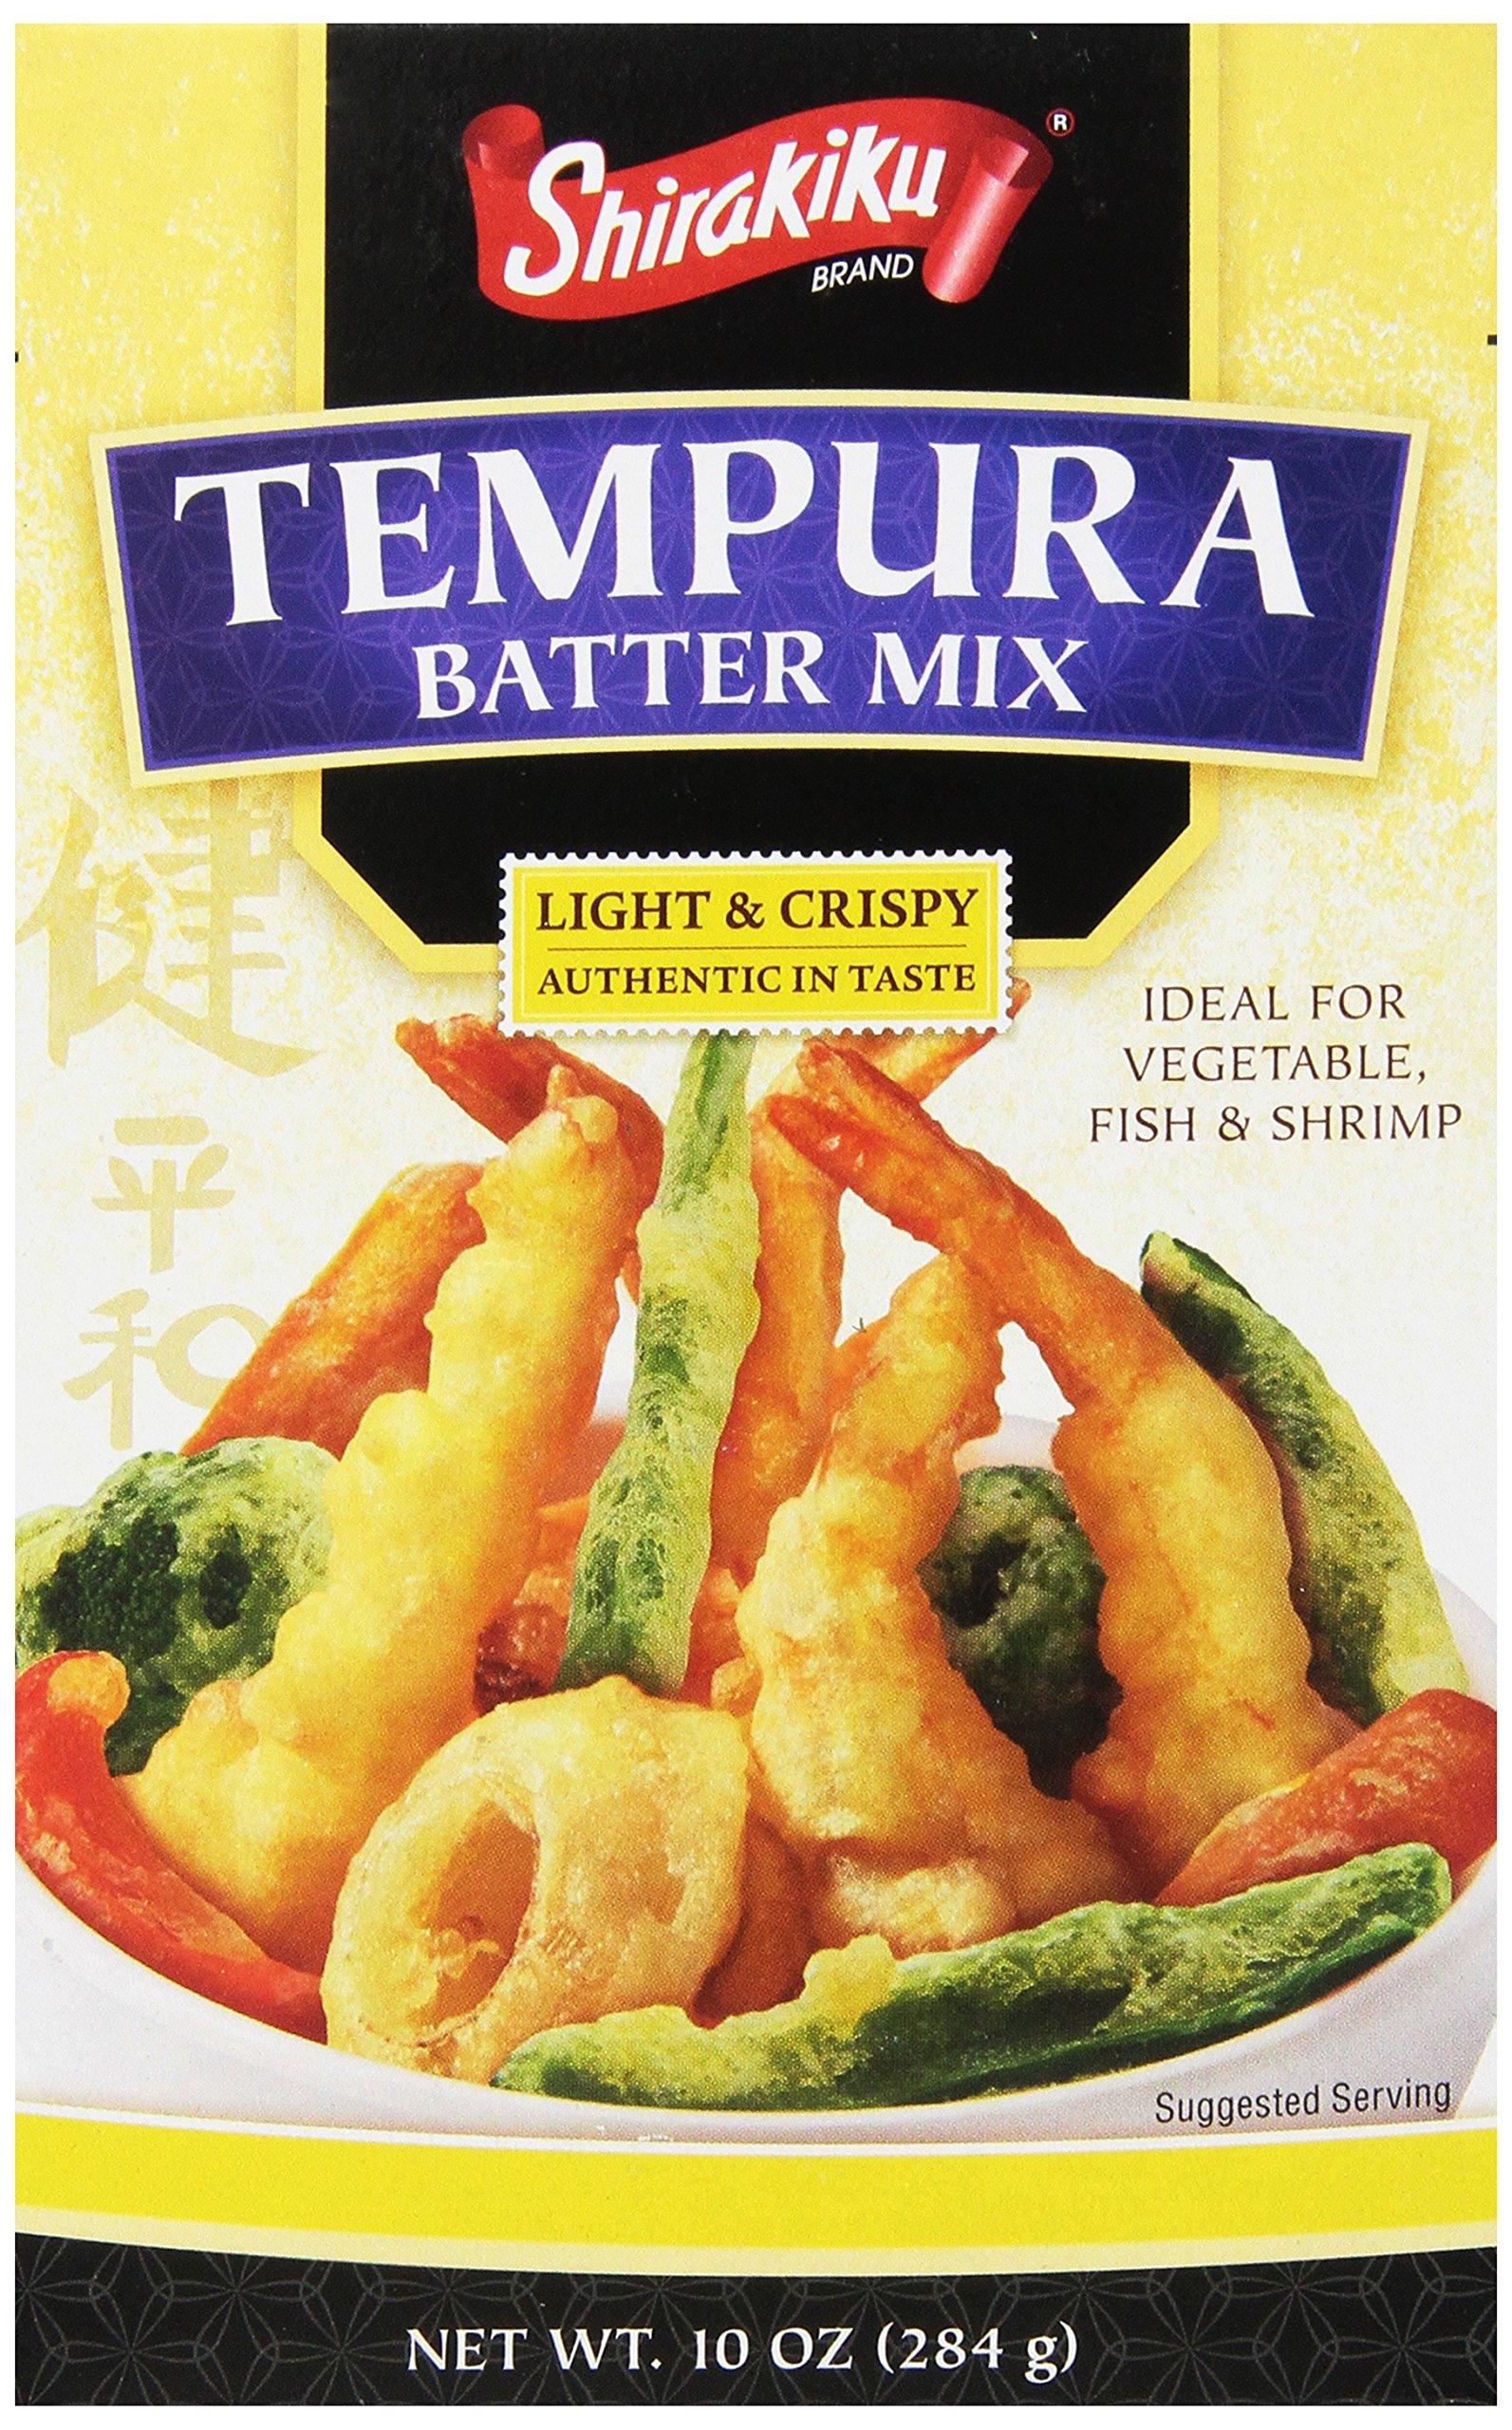 Shirakiku Tempura Batter Mix, 10-Ounce (Pack of 12) by Shirakiku (Image #1)